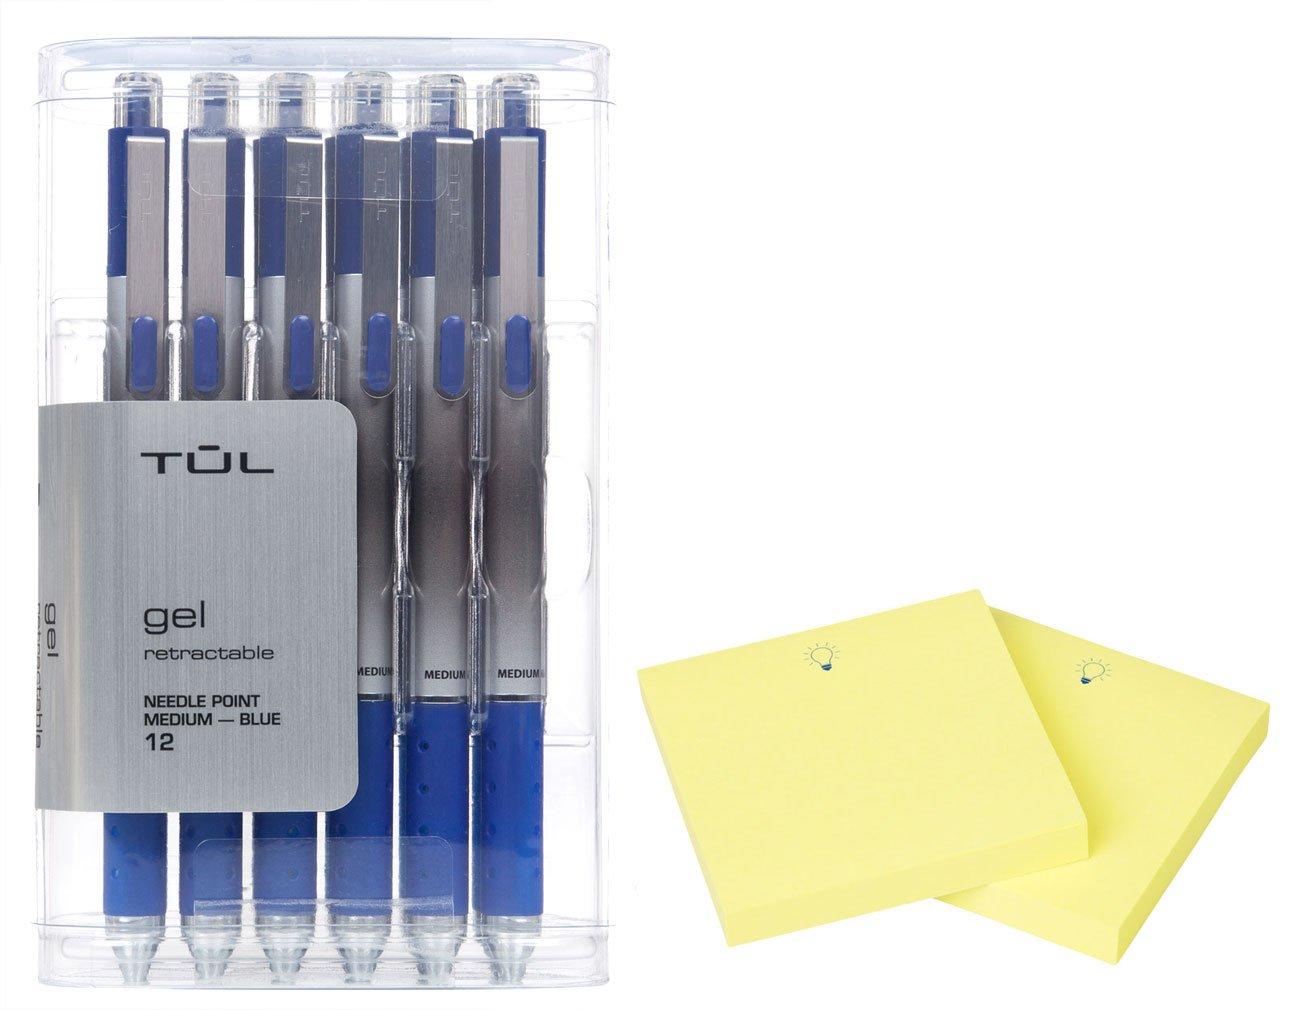 TUL GL1 Gel Pen Retractable Needle Point Medium 0.7mm, Blue 12/pk + ''IdeaPad'' Post-It Notes (200-ct) Bundle